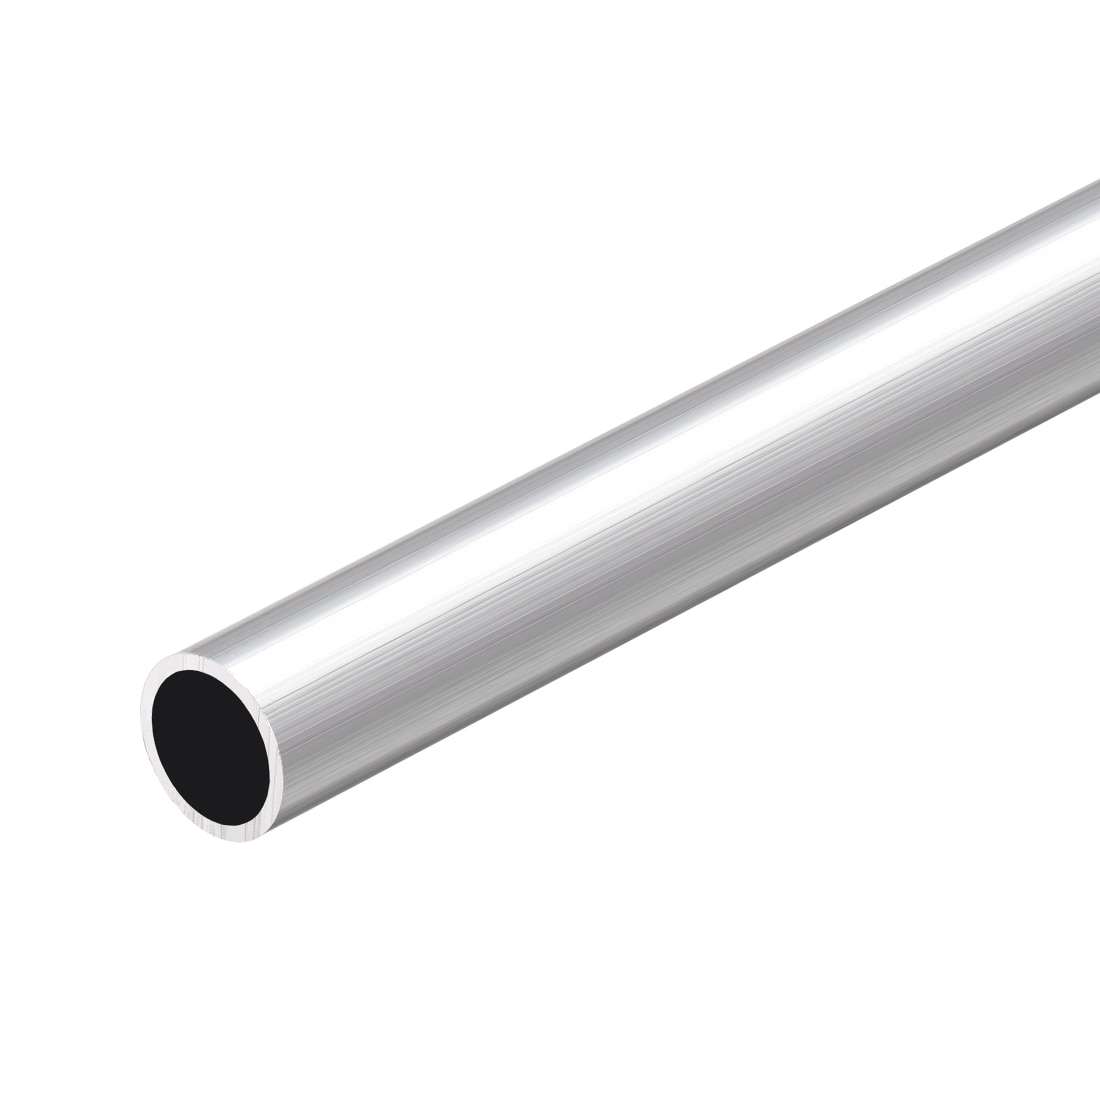 uxcell 1-3pcs 16mm OD 5-15mm Inner Dia Seamless Aluminum Straight Tubing 300mm Length 6063 Aluminum Round Tube